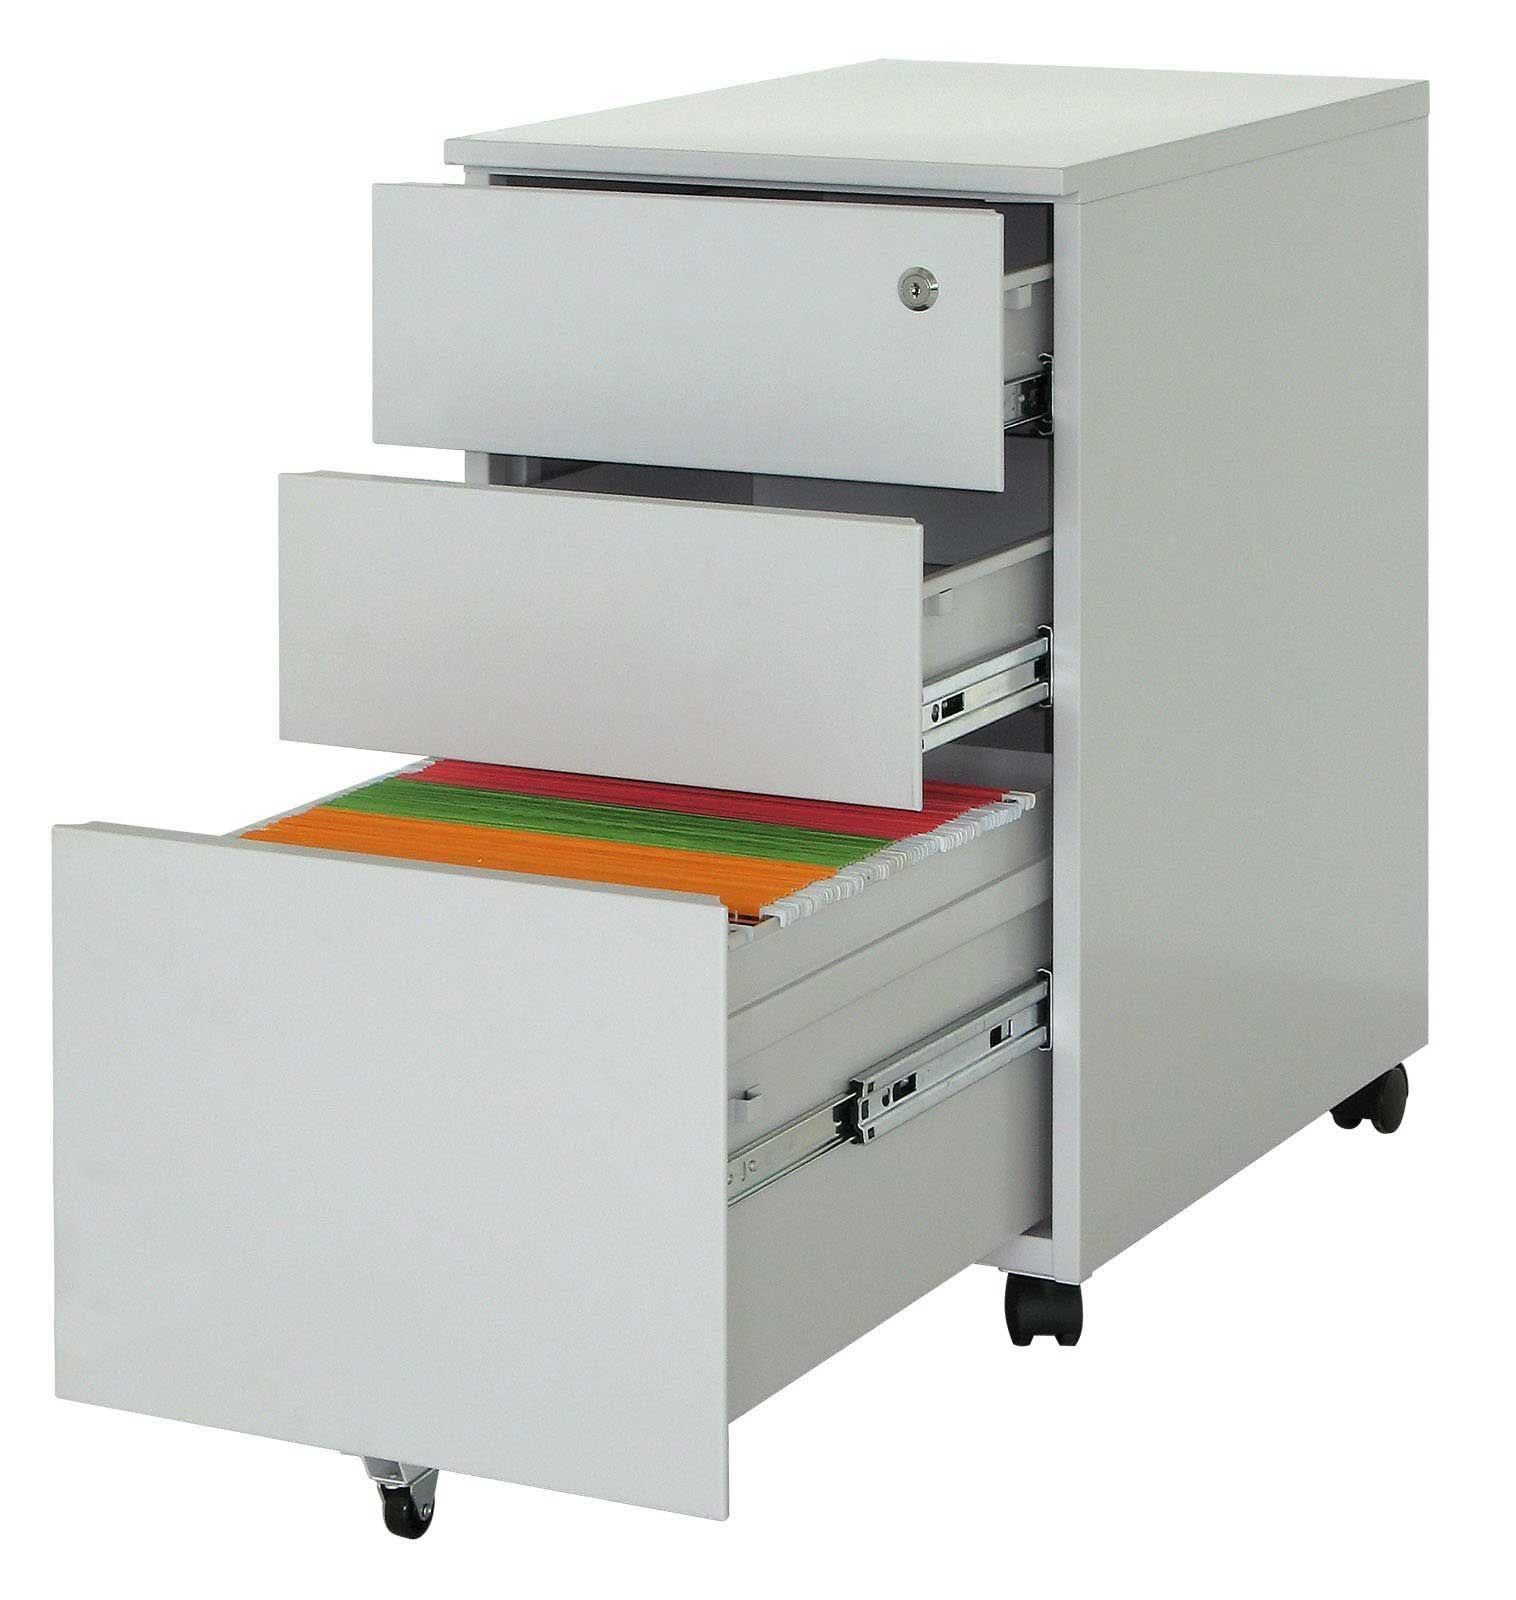 Mobile Metal File Storage Cabinets Unit Storage Cabinet With Drawers Office Storage Cabinets Filing Cabinet